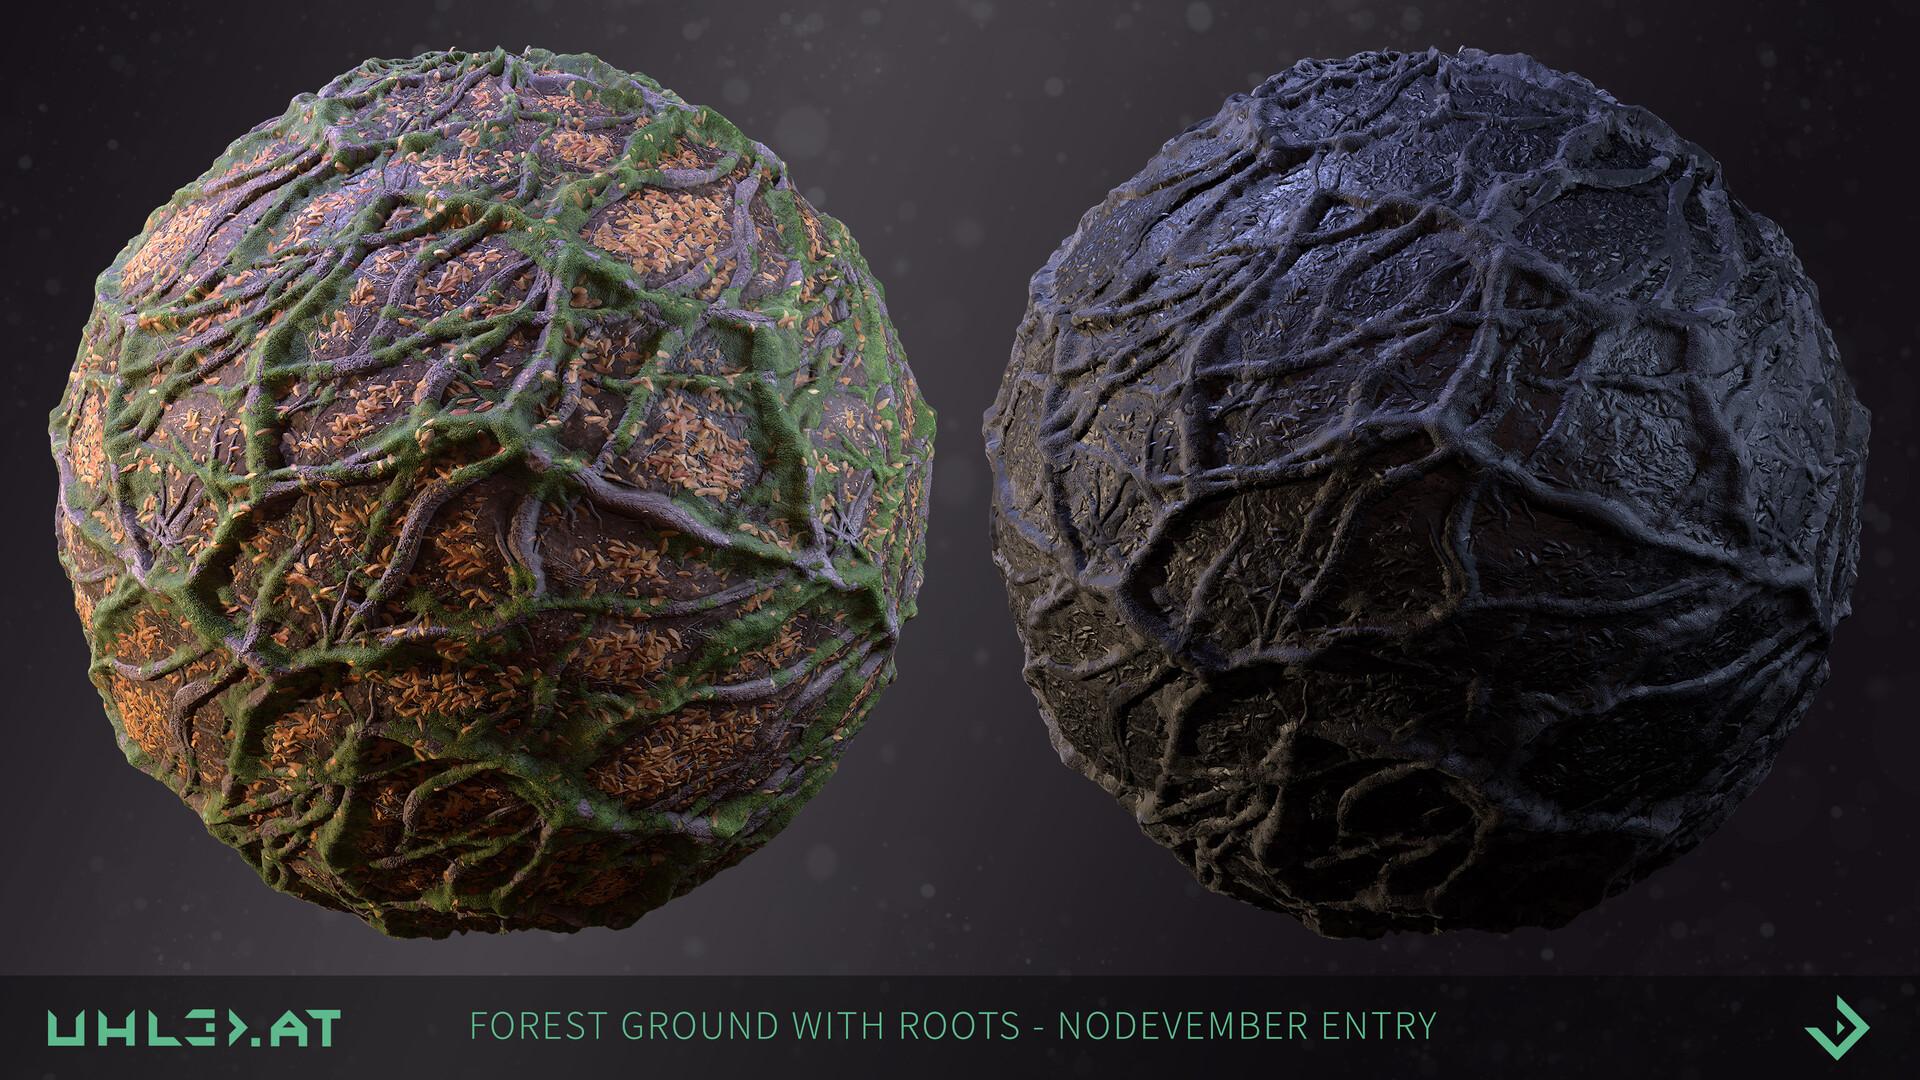 Dominik uhl organic woodgrounds with roots 01